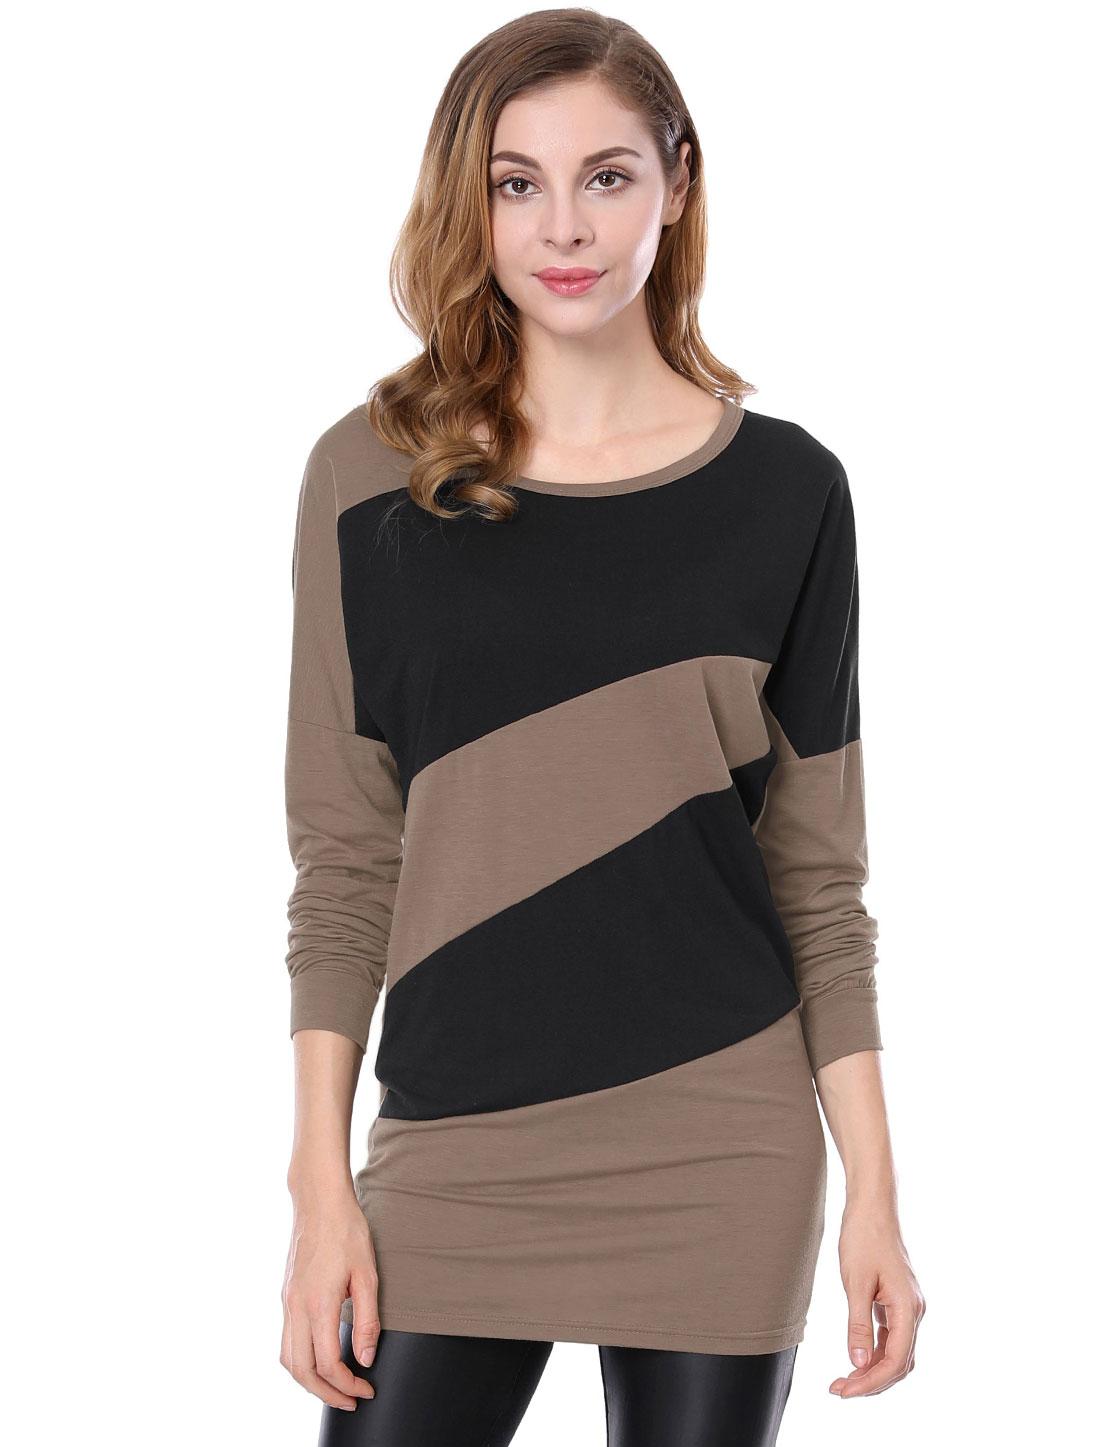 Ladies Chic Scoop Neck Long Batwing Sleeve Light Coffee Black Blouson Tunic XS